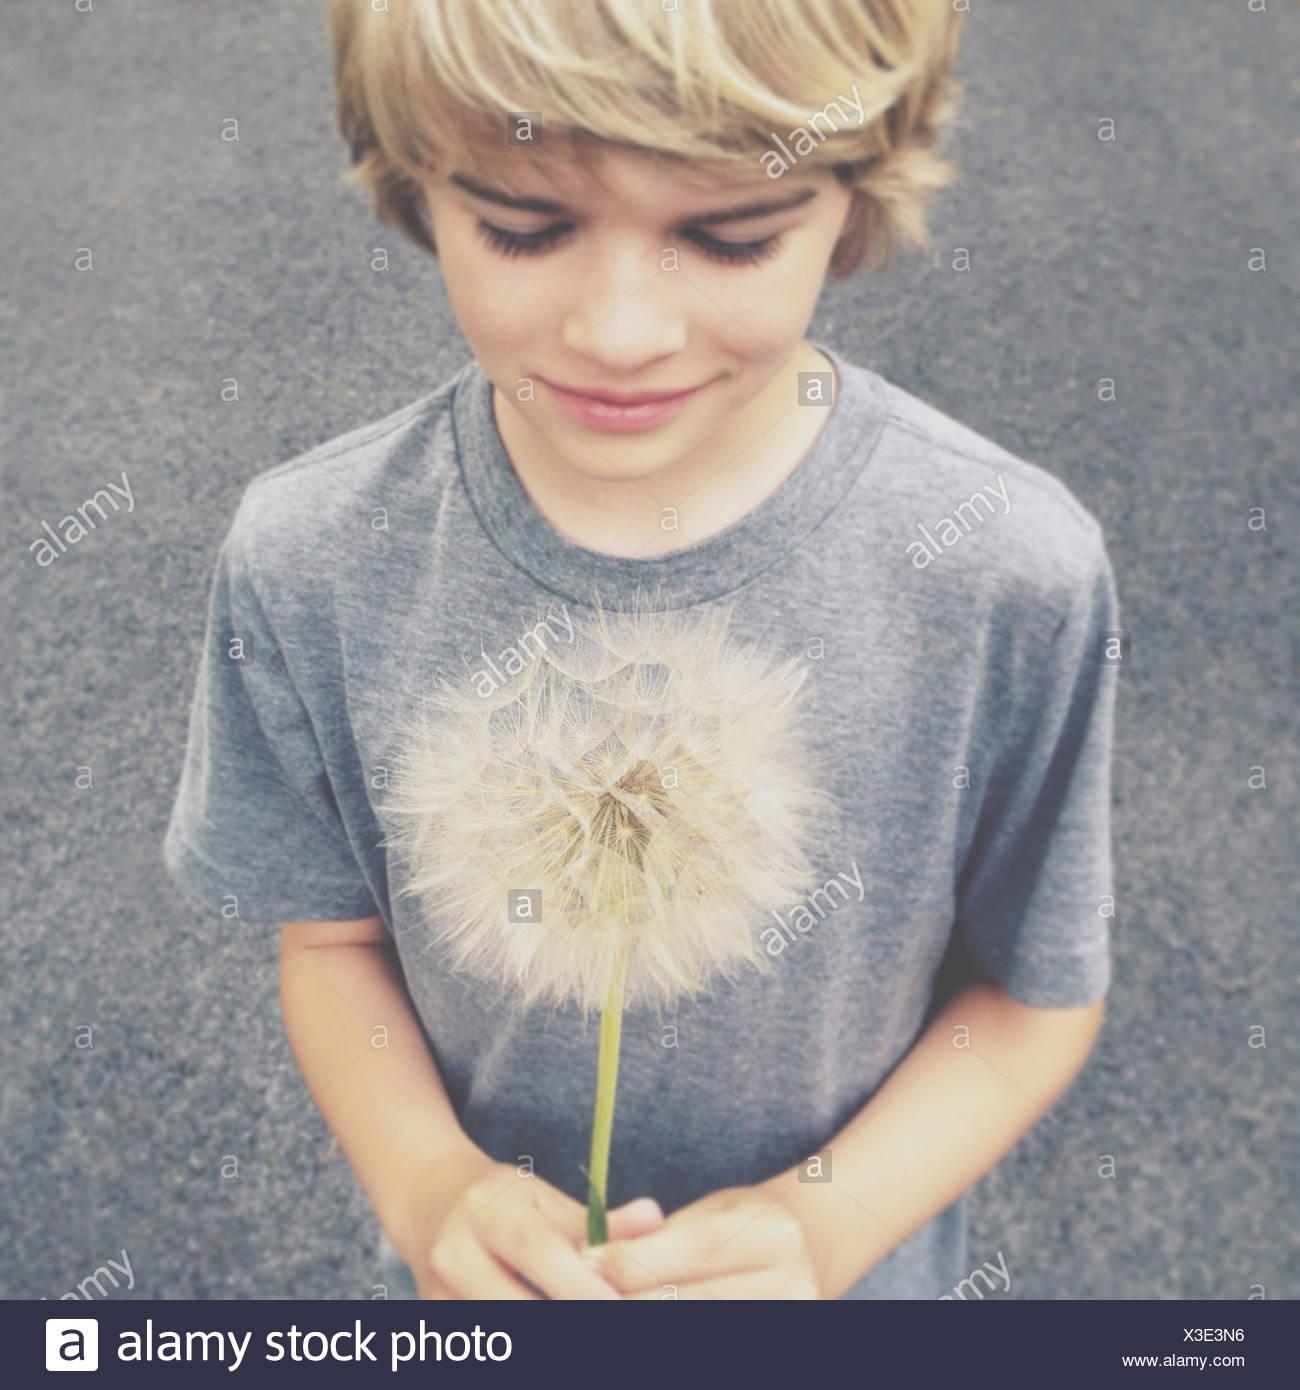 Blonde boy holding giant dandelion - Stock Image